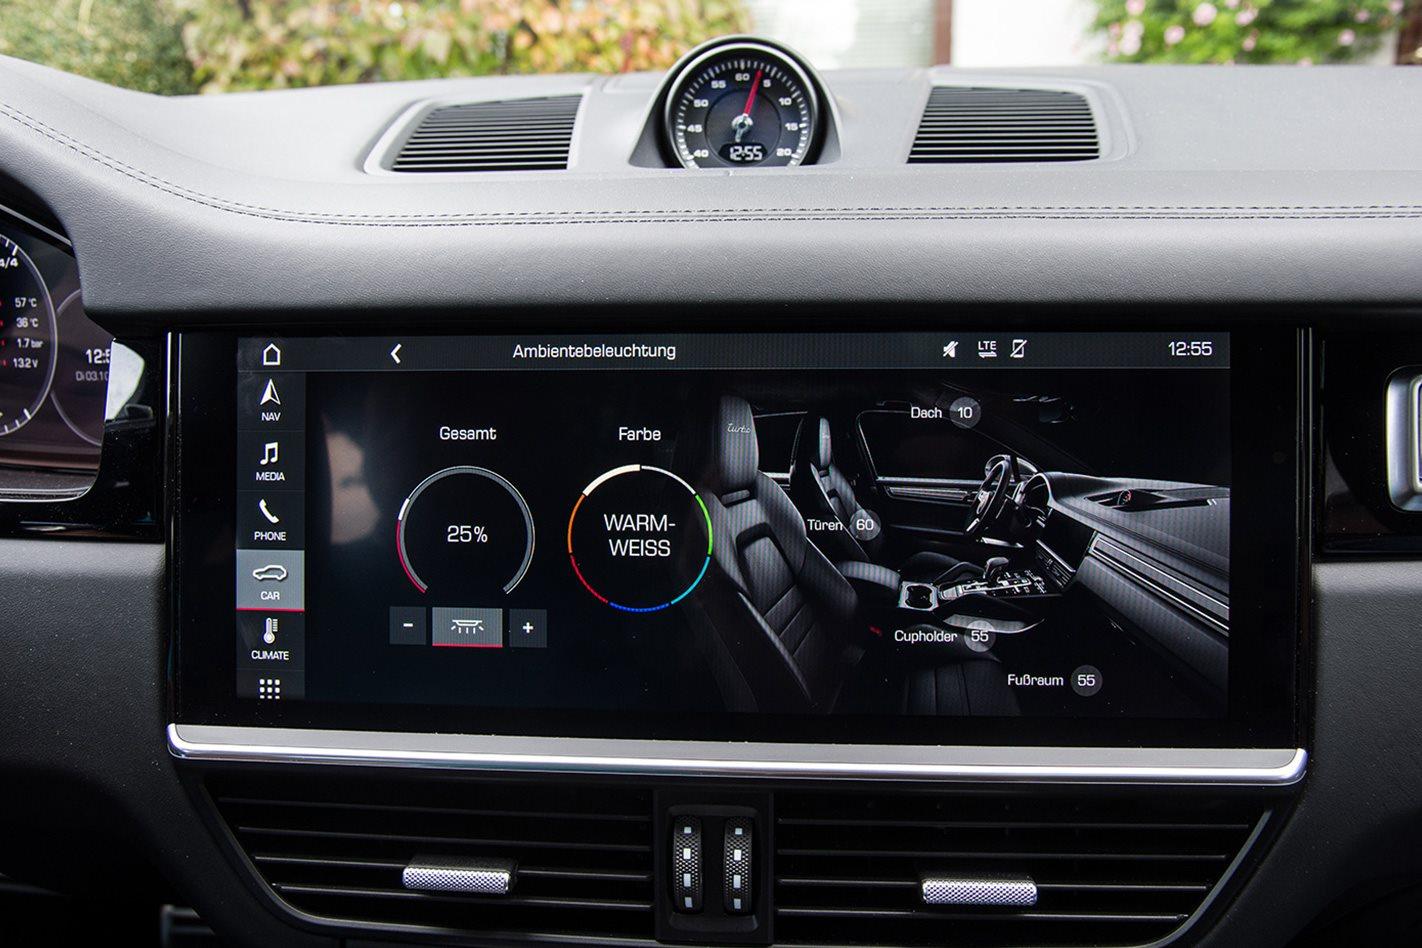 2018-Porsche-Cayenne-Turbo electronics